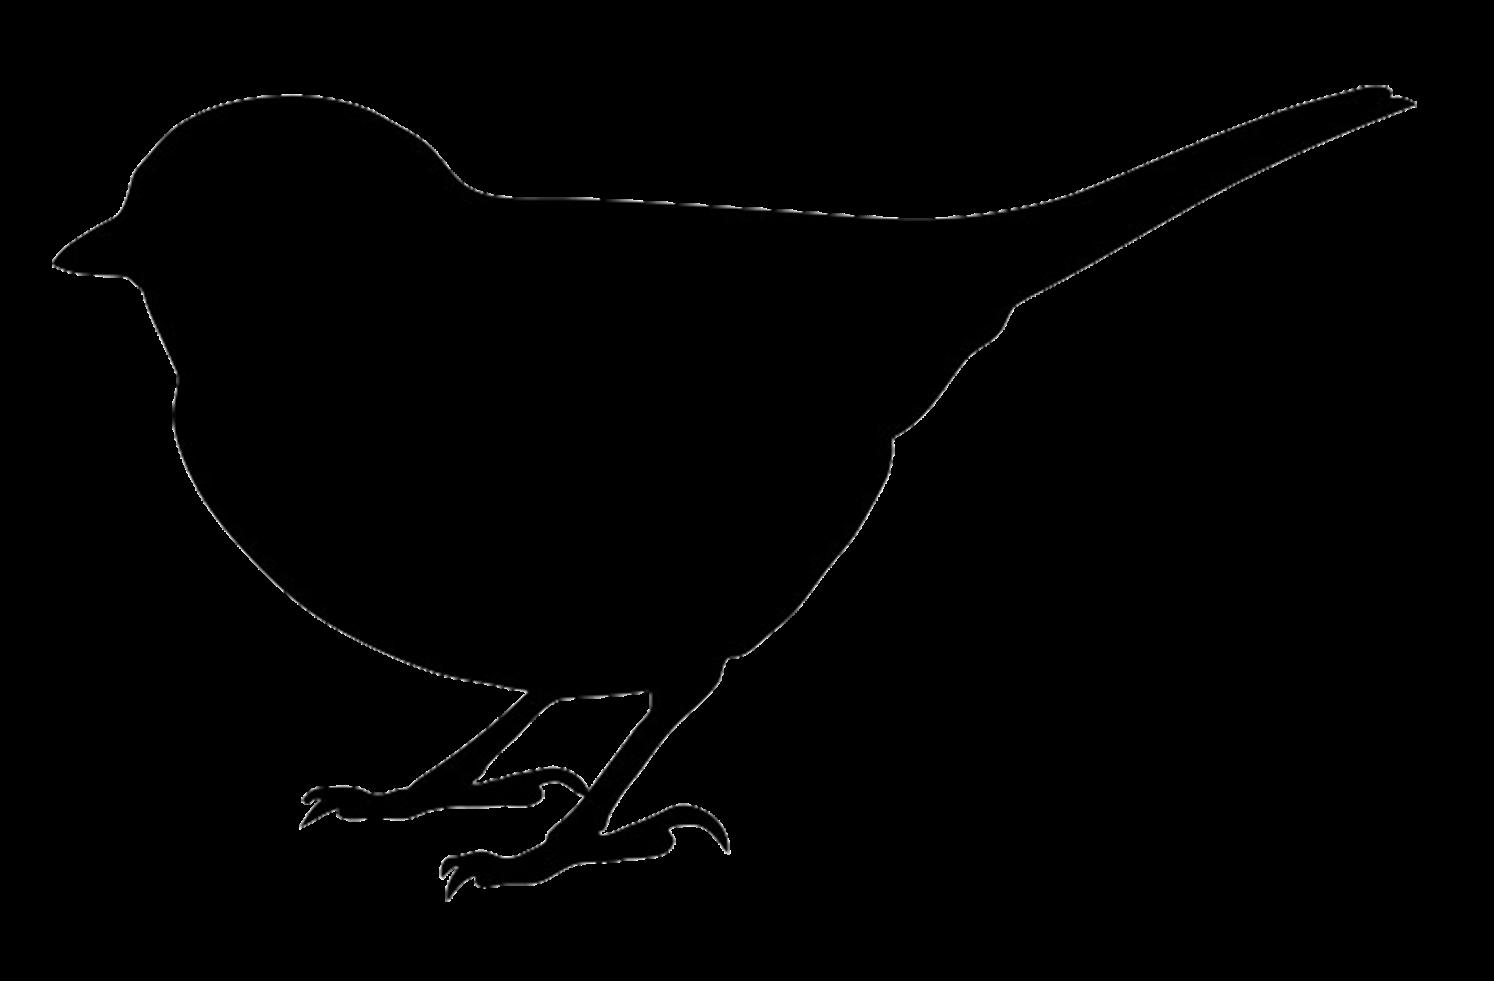 Mockingbird silhouette at getdrawings. Clipart bird mockingjay